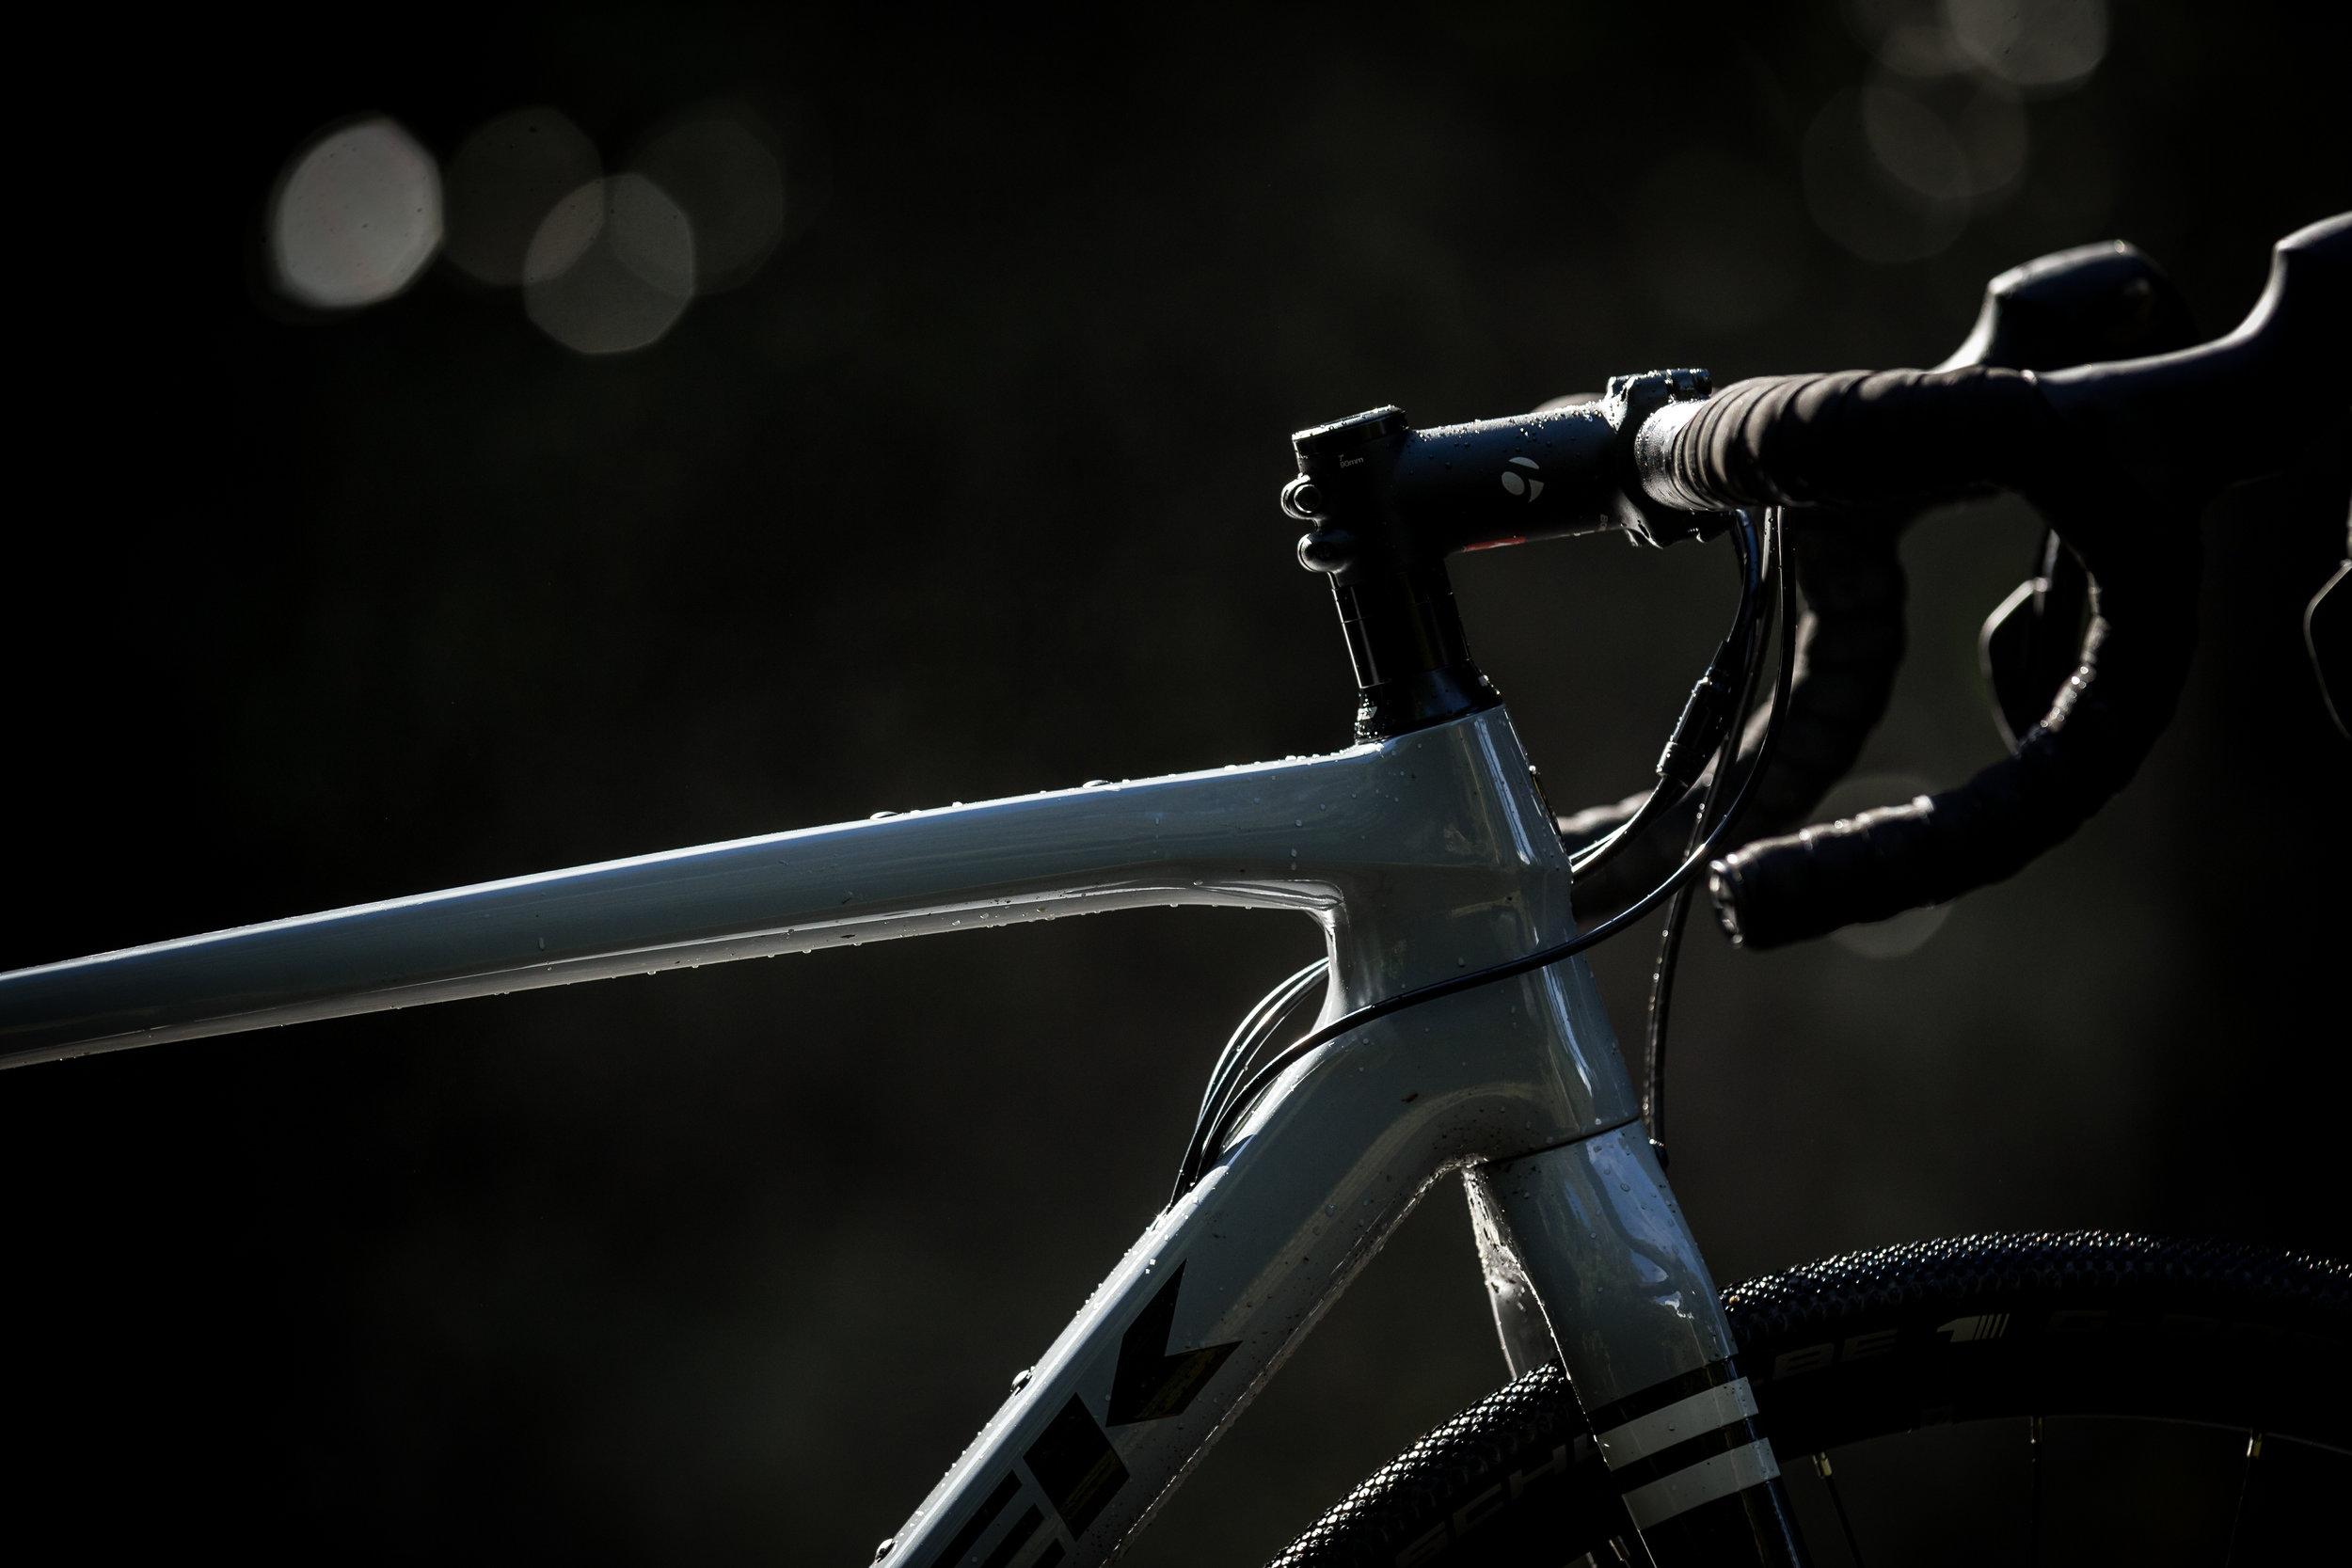 Trek Checkpoint SL 5 — New Zealand Cycling Journal